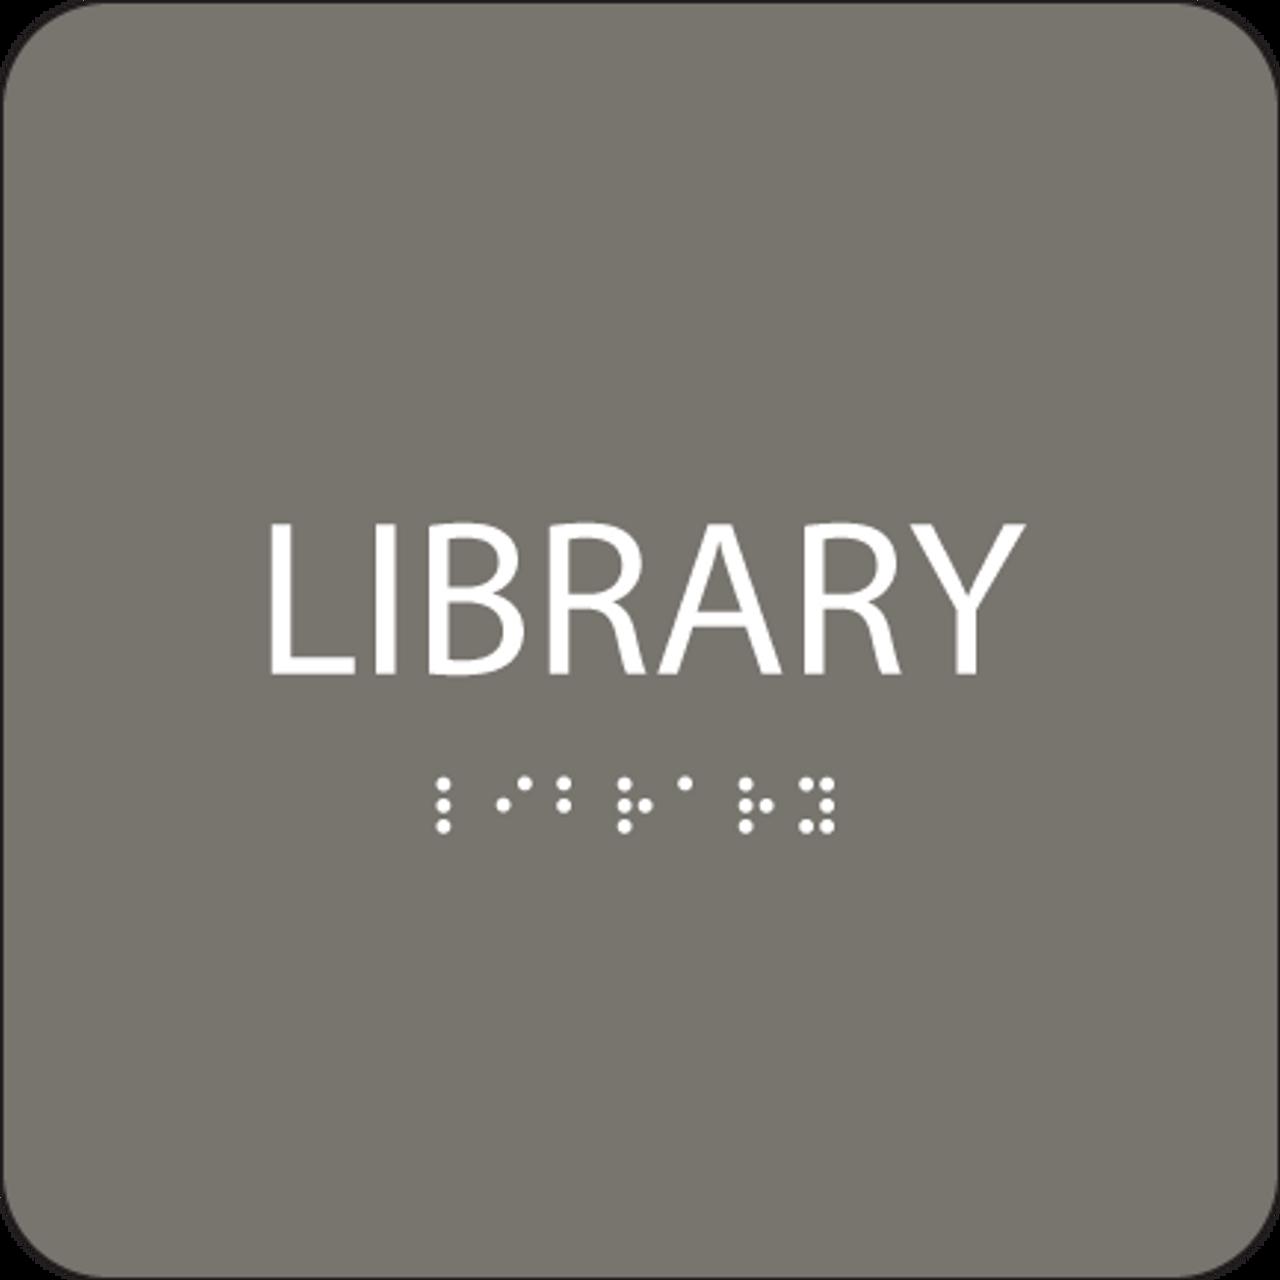 Dark Grey Library ADA Sign